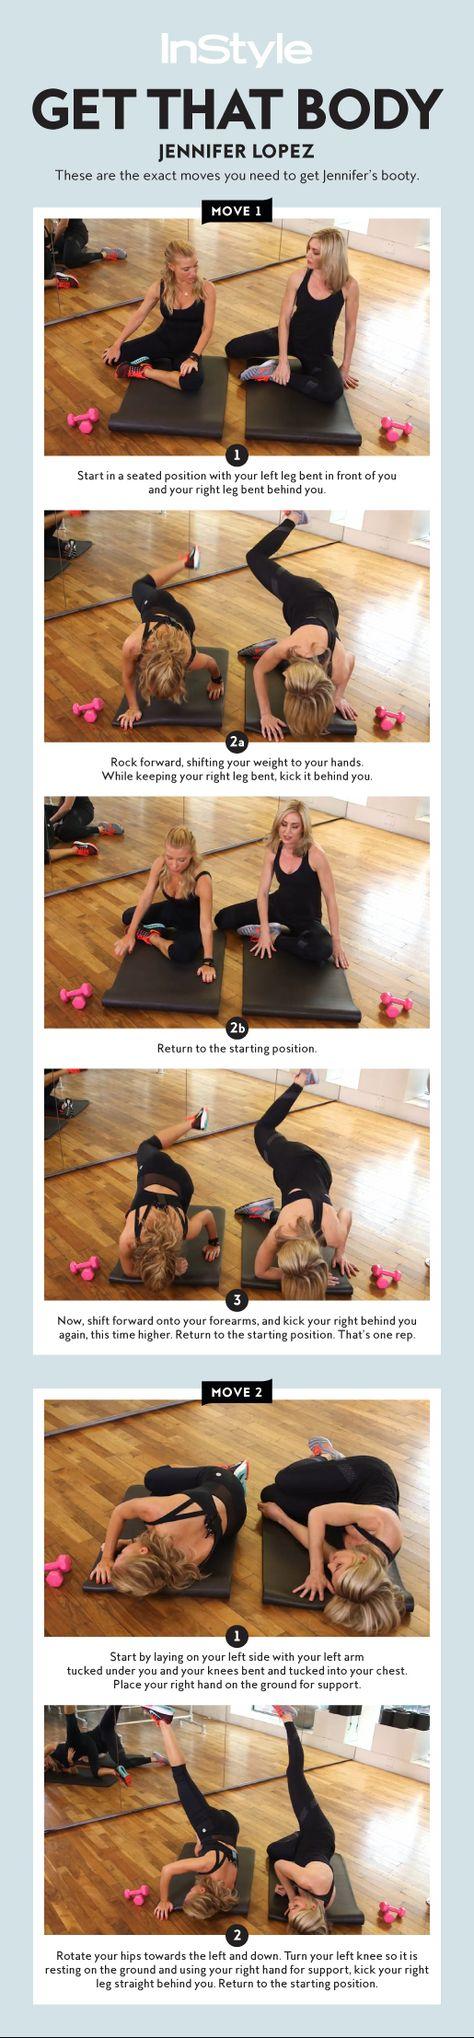 Video: How to Get a Body Like Jennifer Lopez